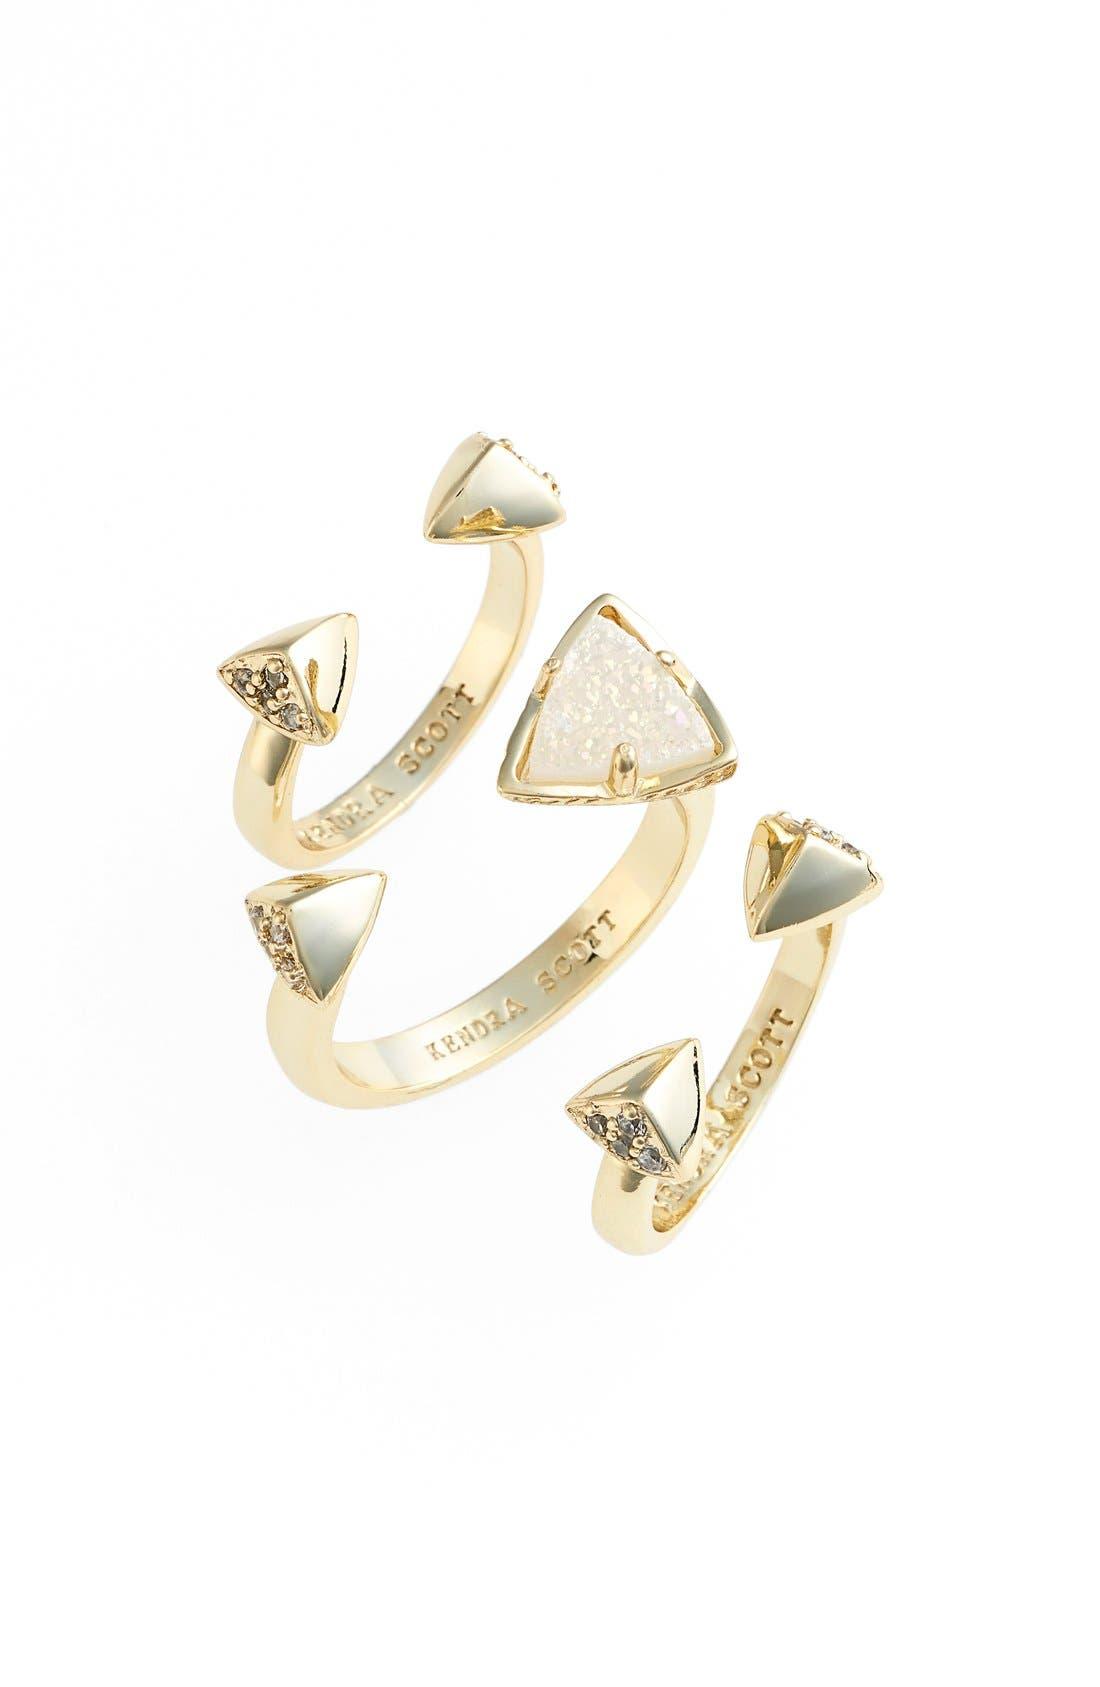 Main Image - Kendra Scott 'Brennan' Spiked Open Ring & Midi Rings (Set of 3)